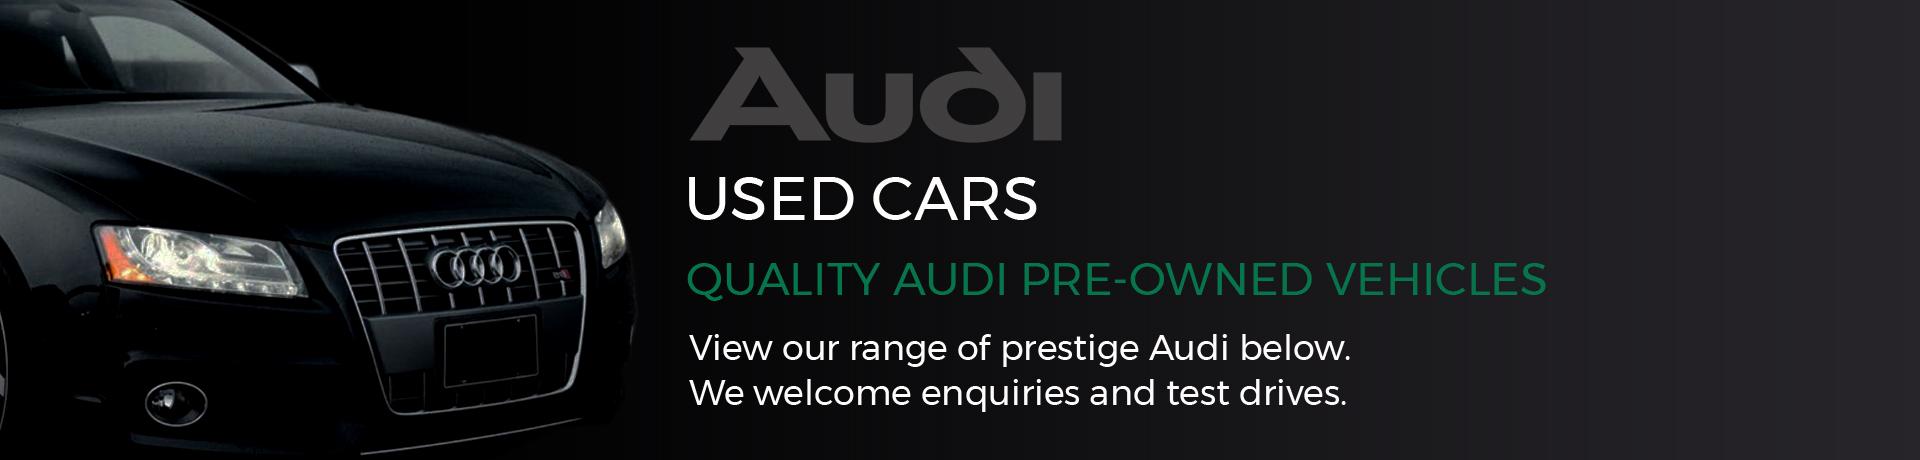 Audi Used Cars Adelaide